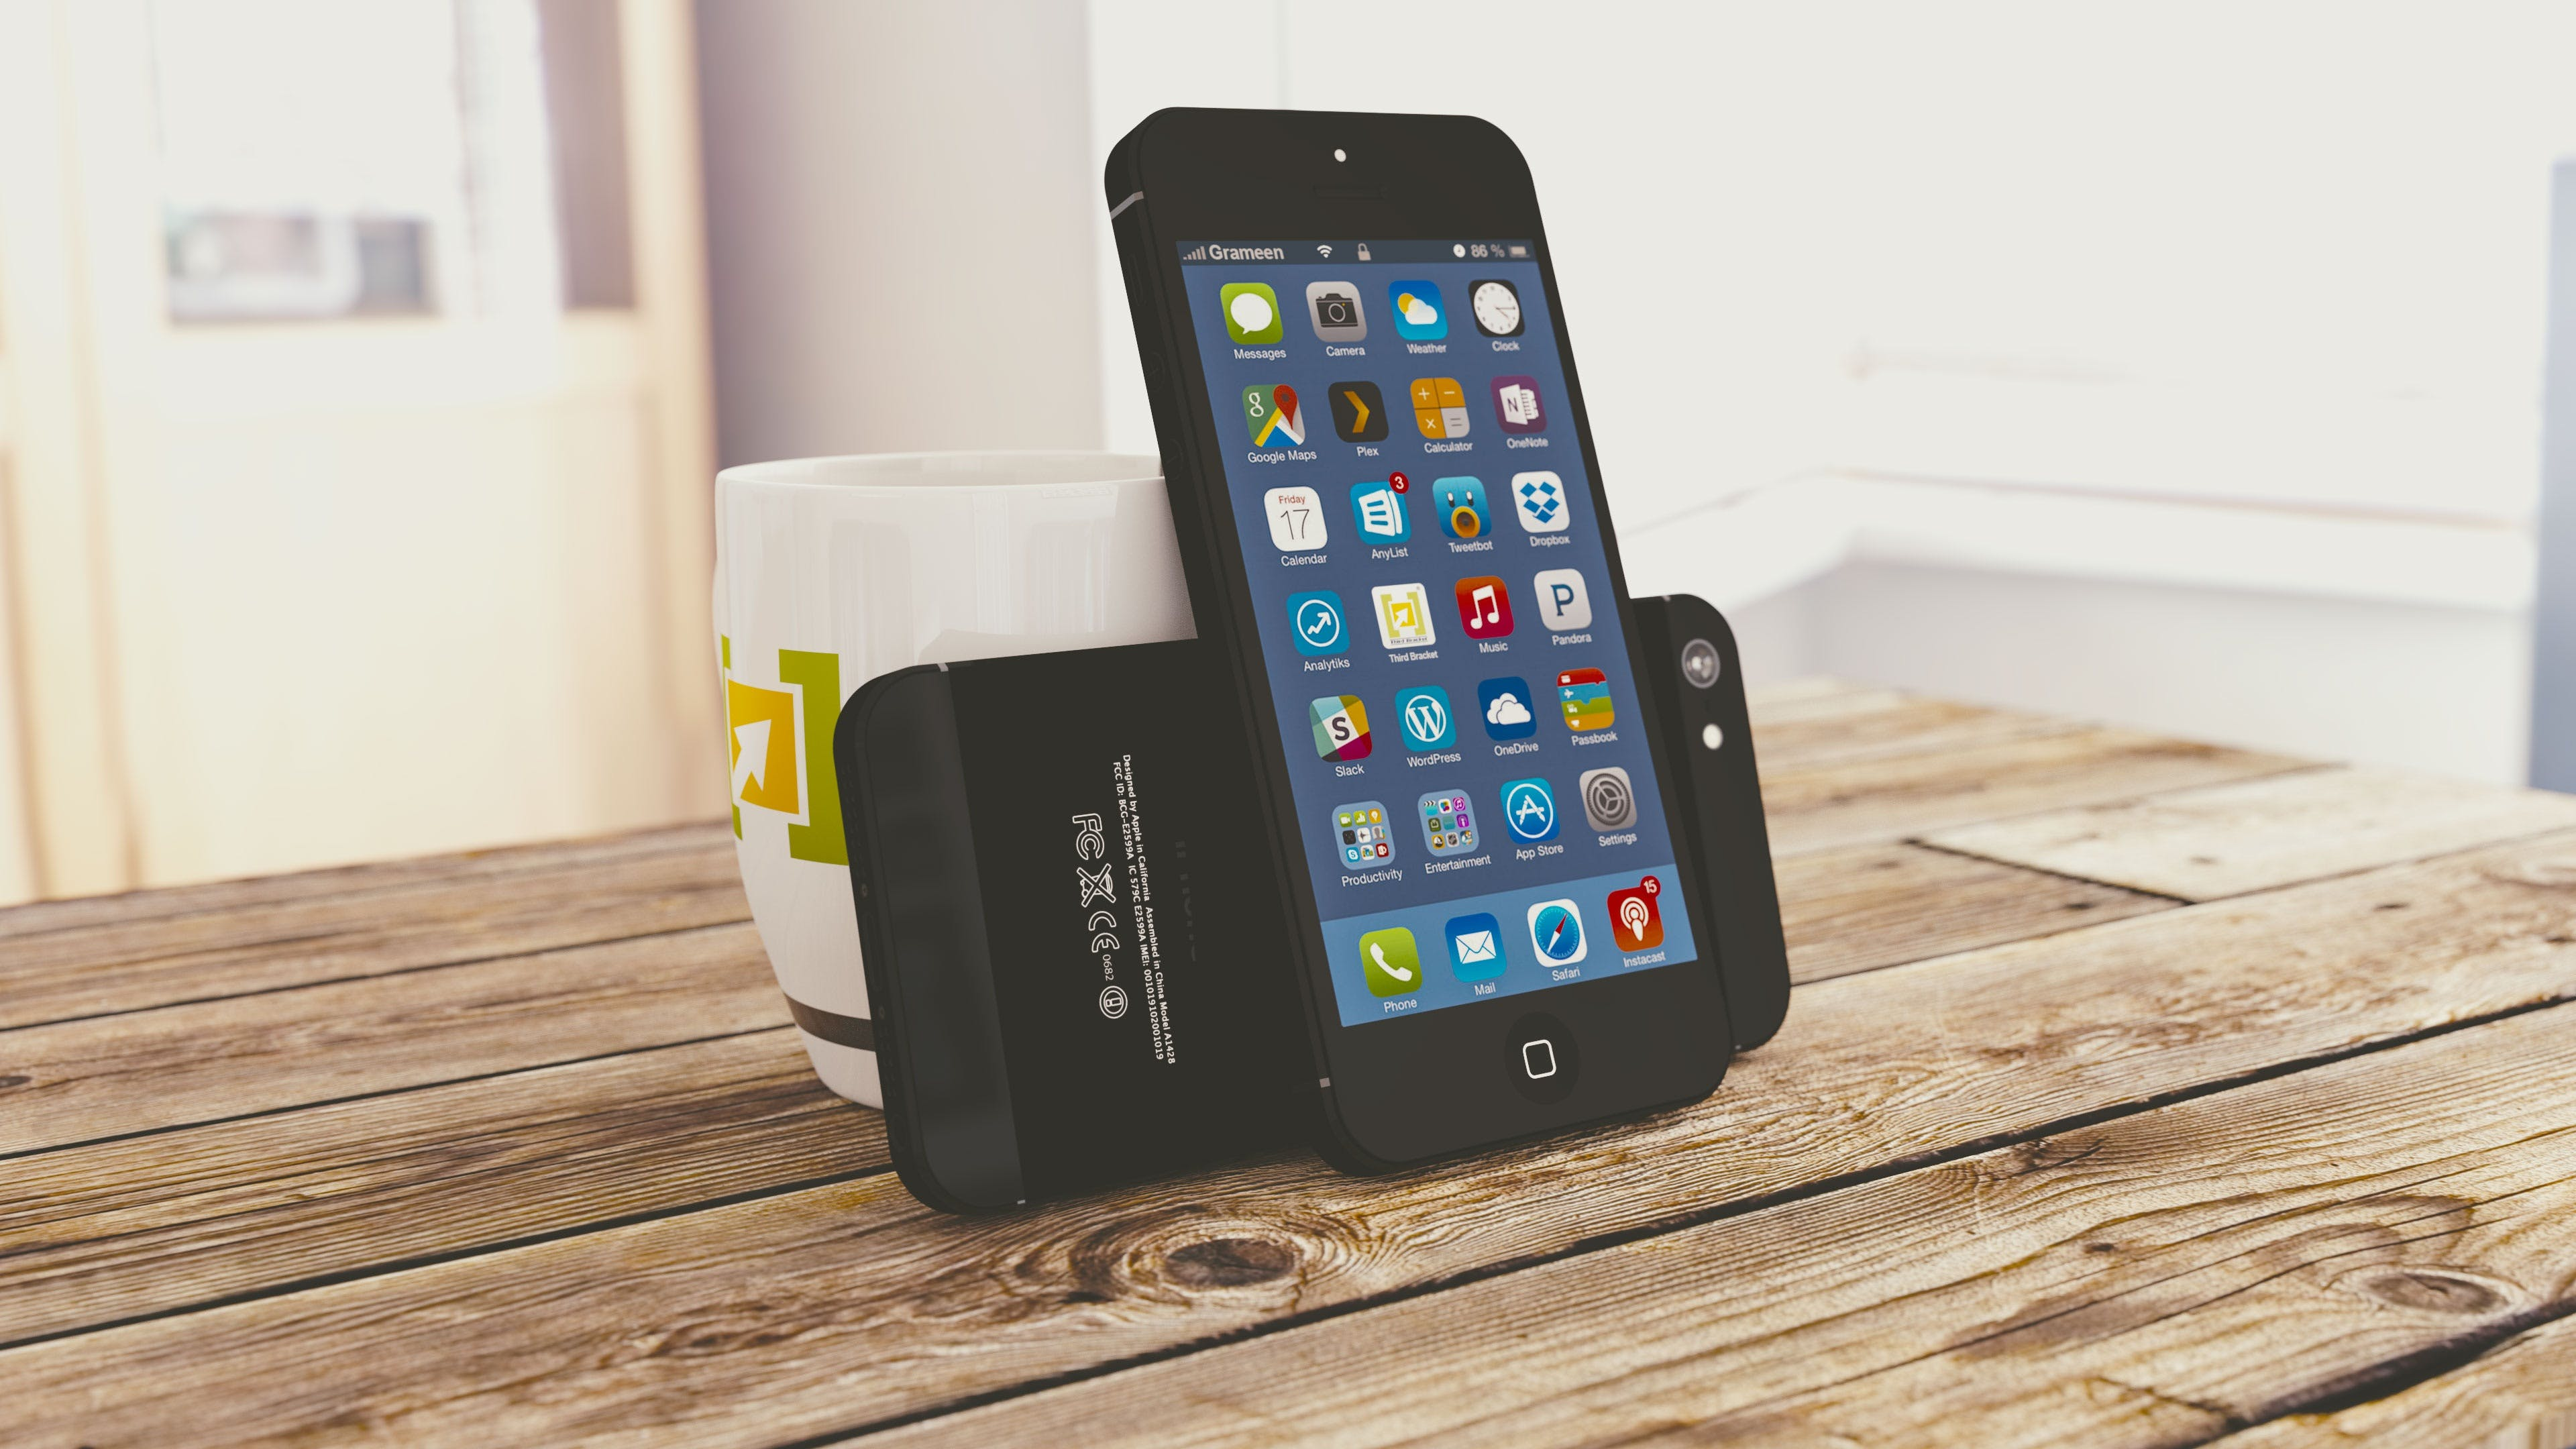 iPhone, iPhone 6, 手機, 智慧手機 的 免费素材照片